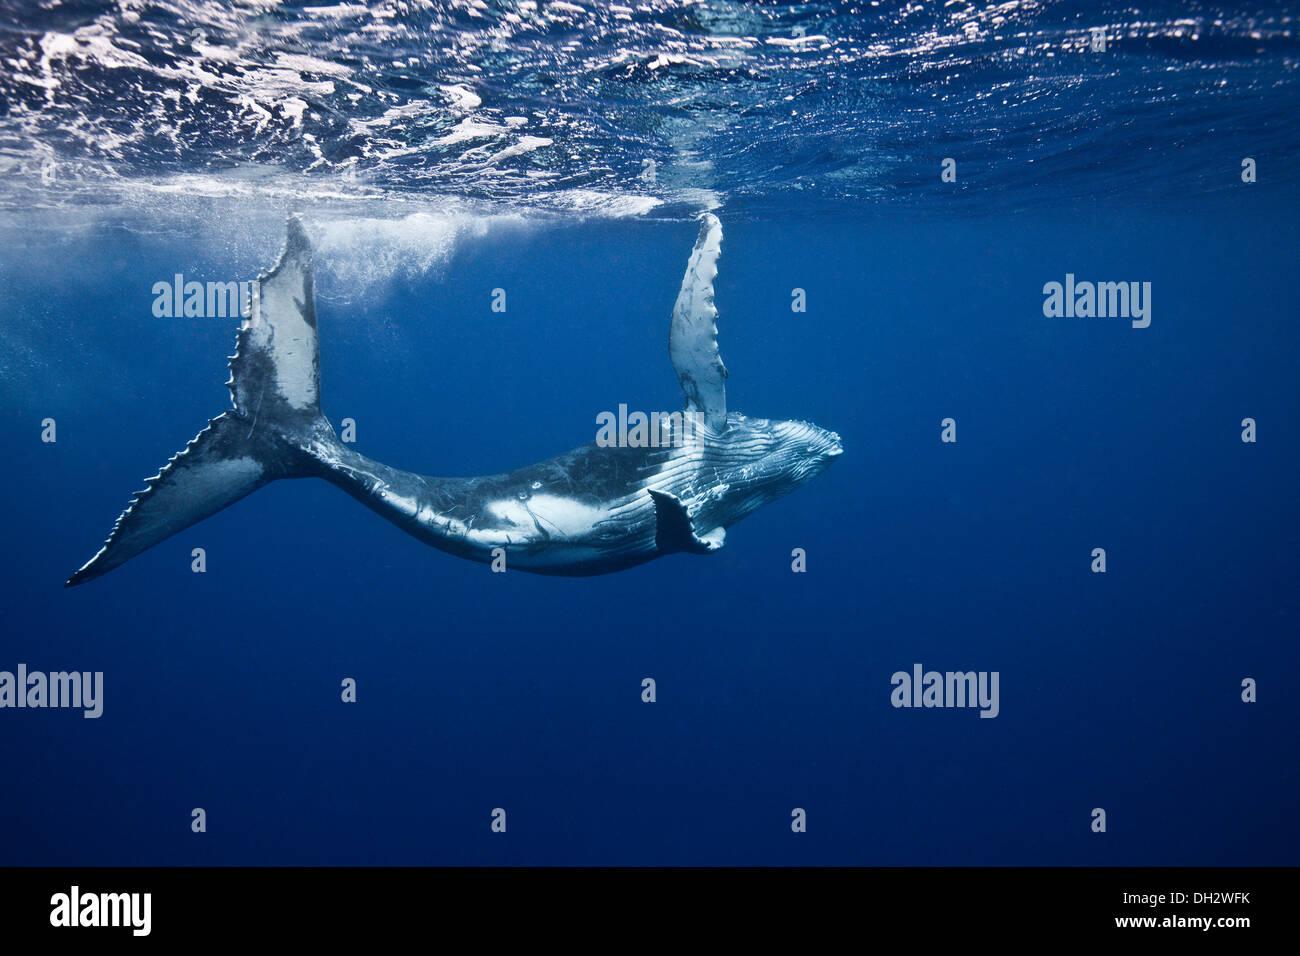 Les baleines à bosse underwater Photo Stock